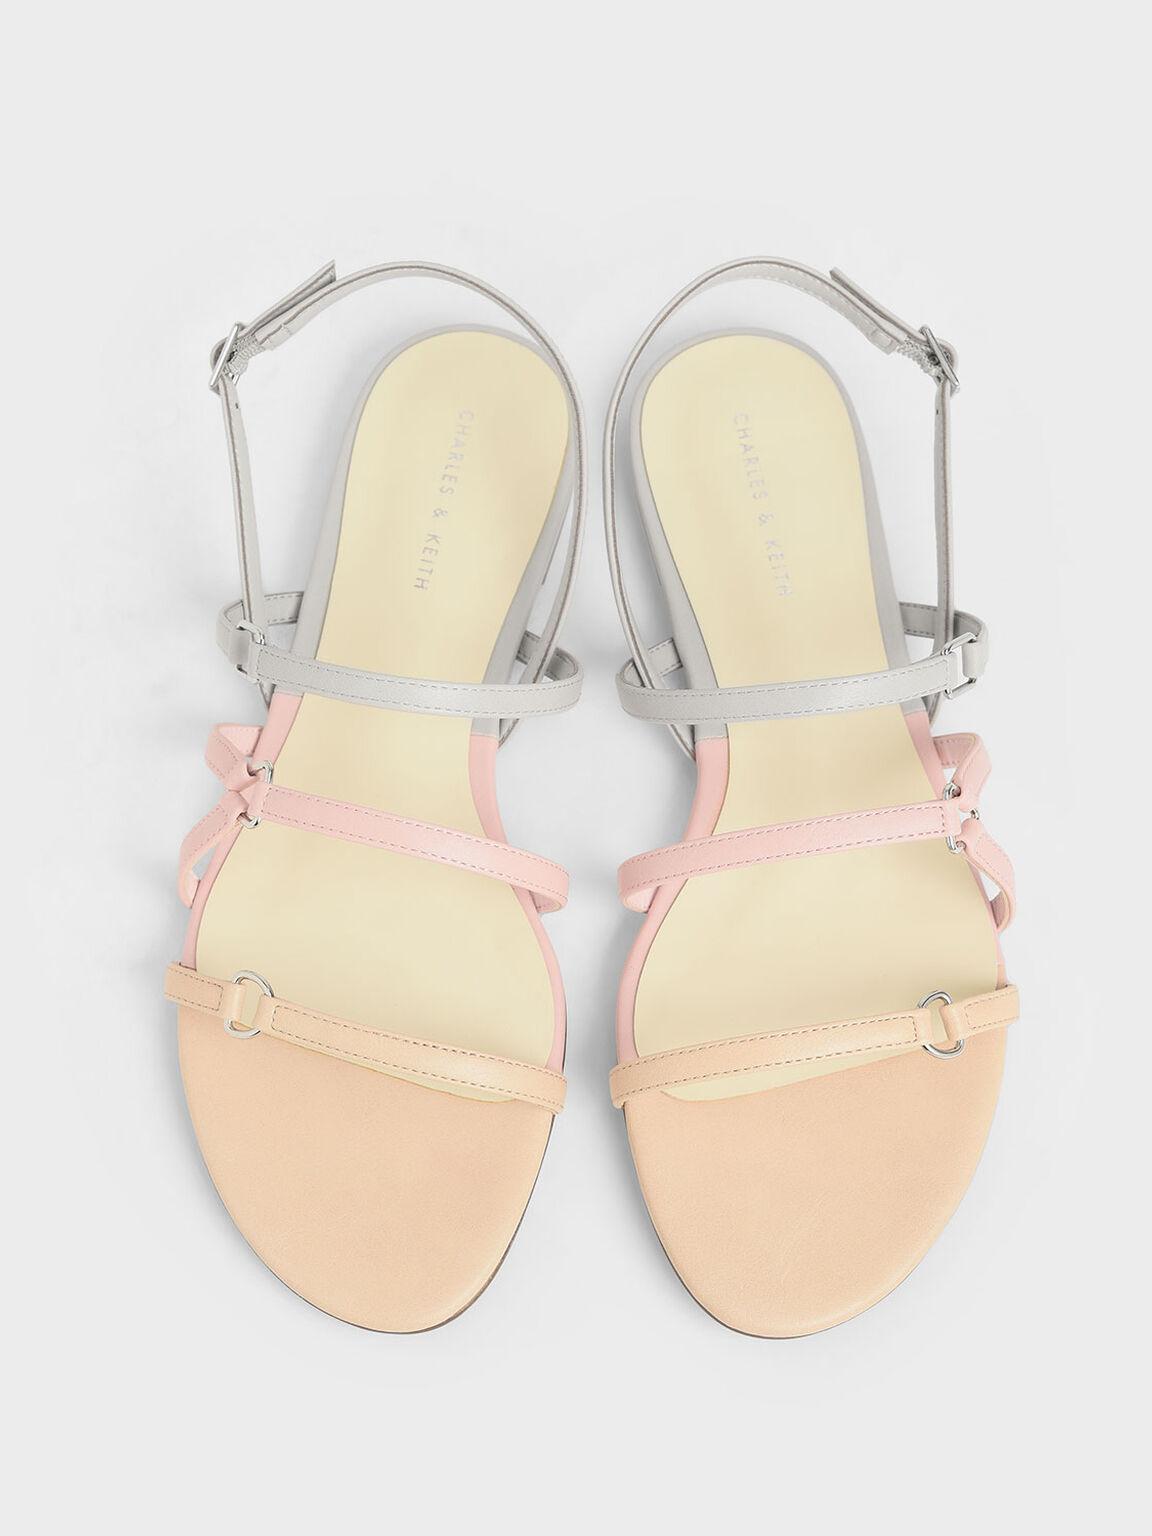 Tri-Strap Slingback Sandals, Multi, hi-res